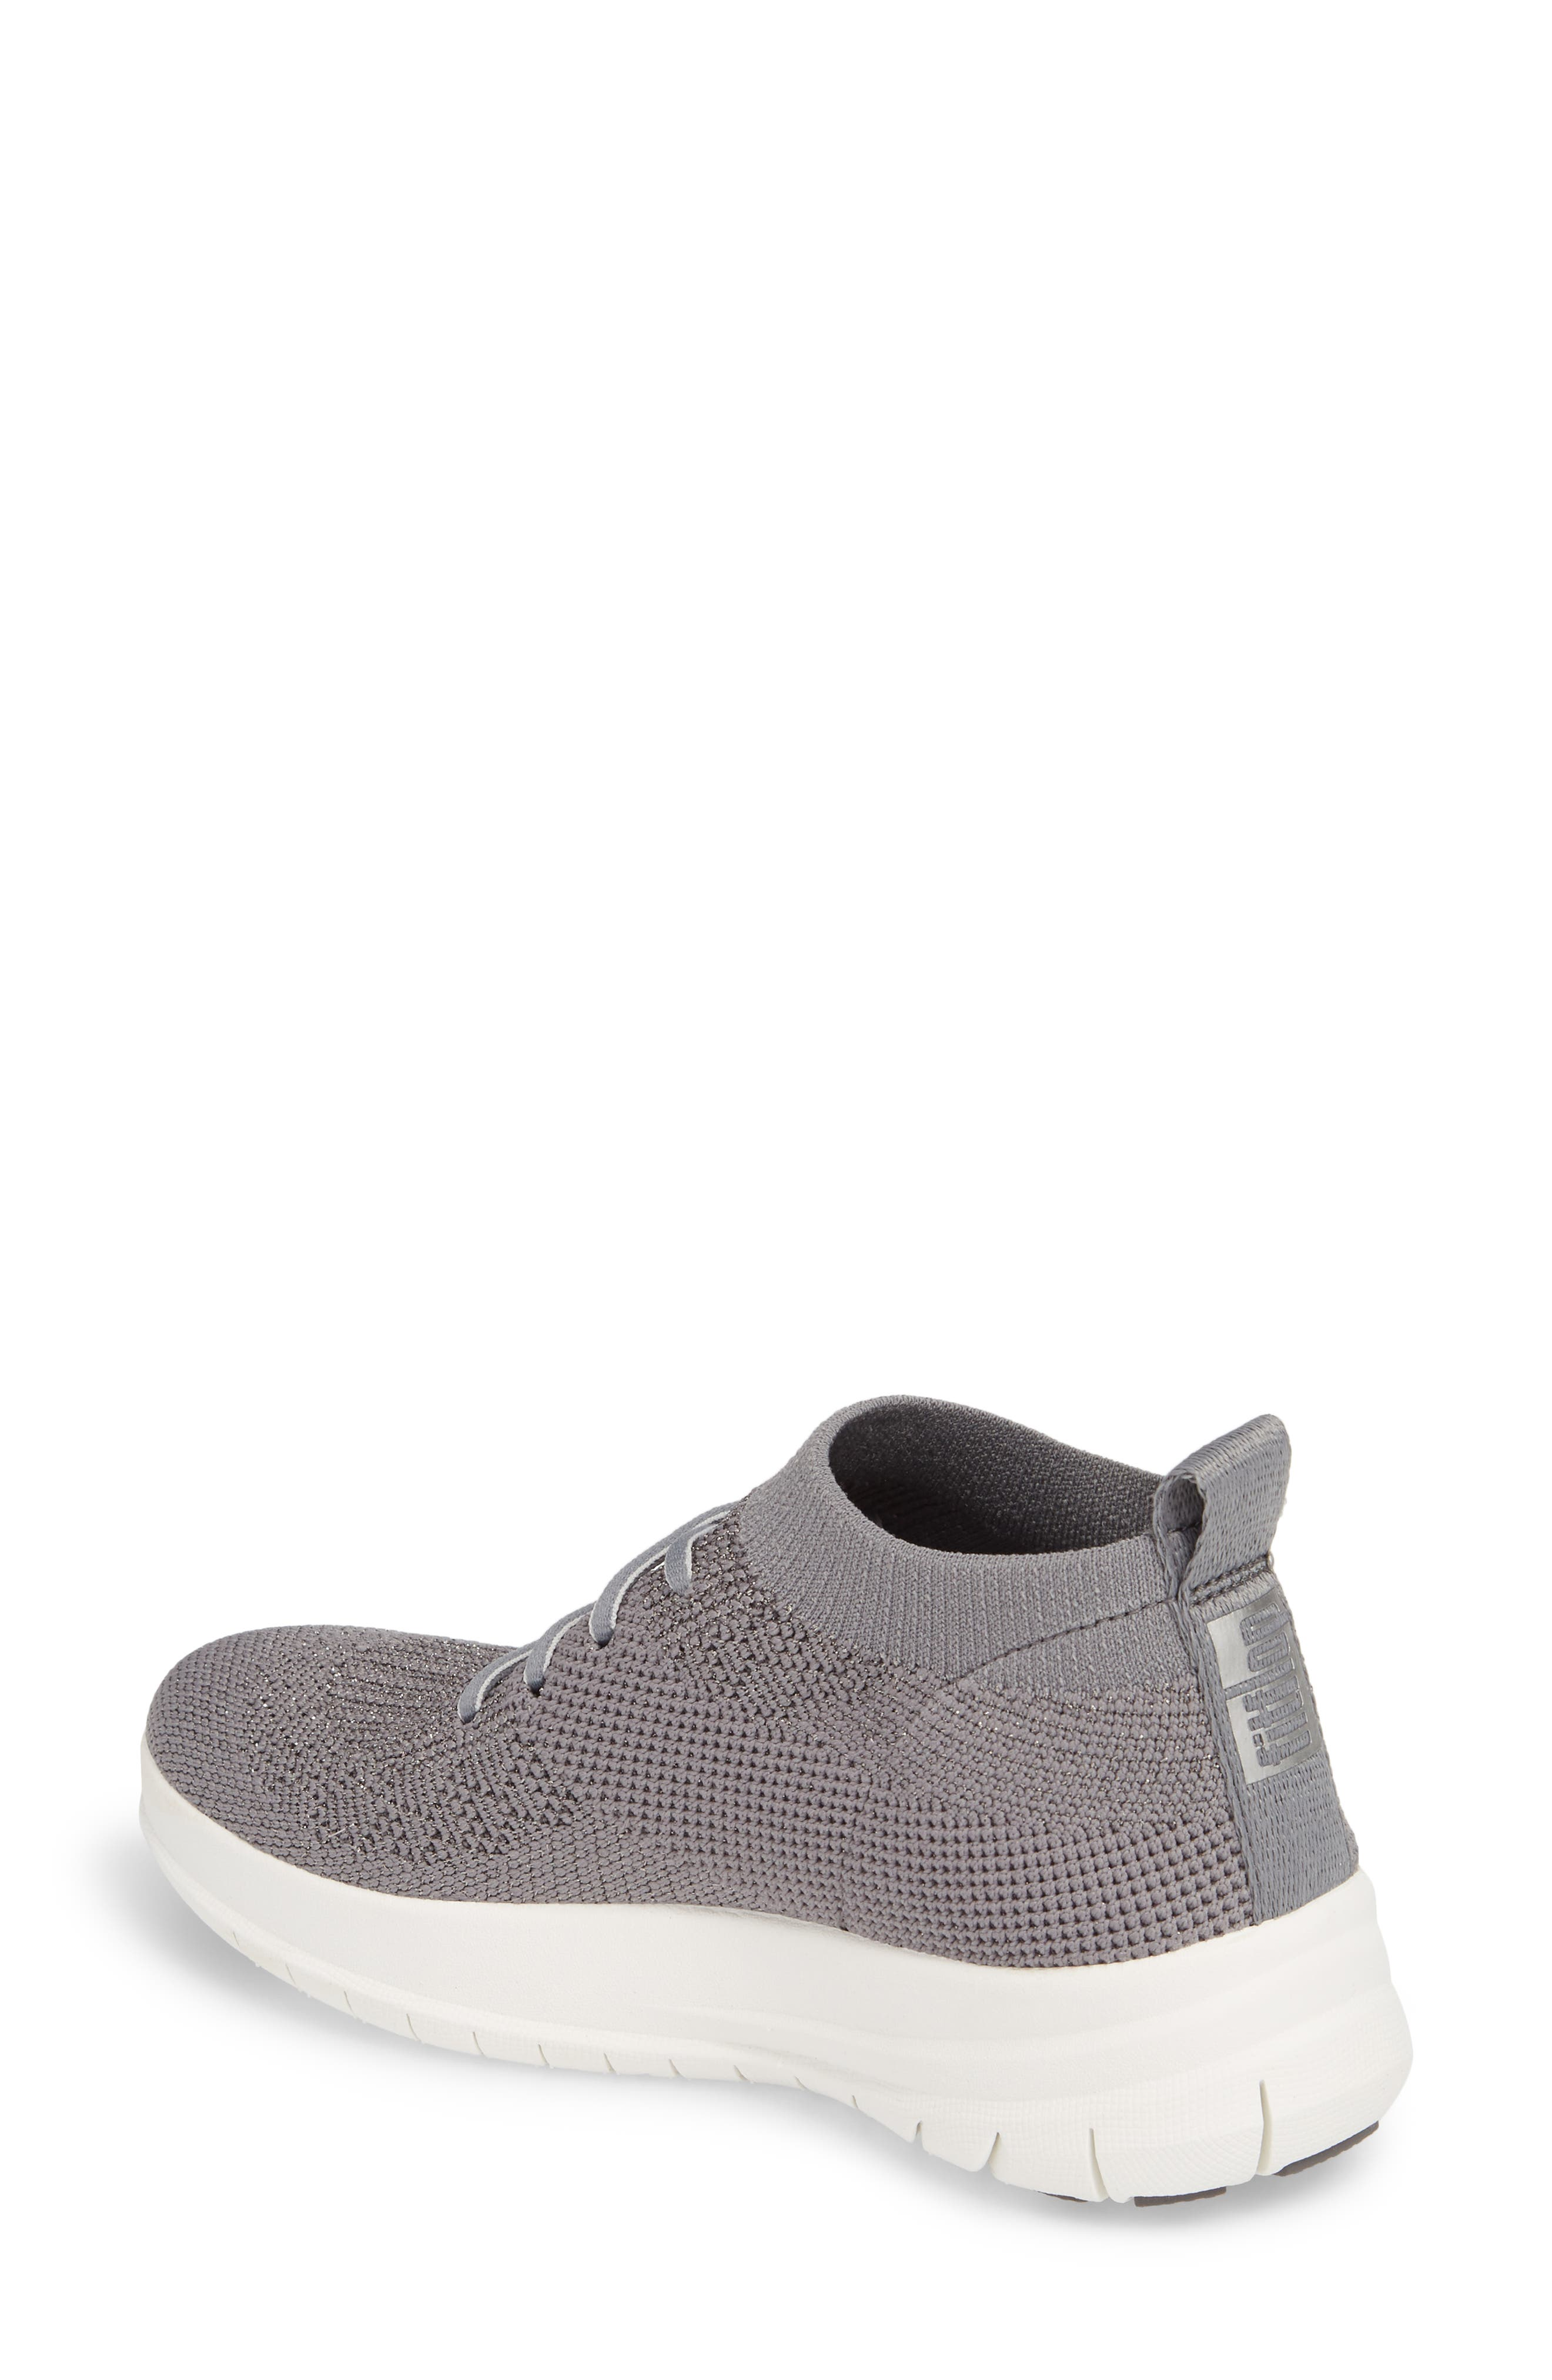 Uberknit<sup>™</sup> Slip-On High-Top Sneaker,                             Alternate thumbnail 2, color,                             Charcoal/ Metallic Pewter